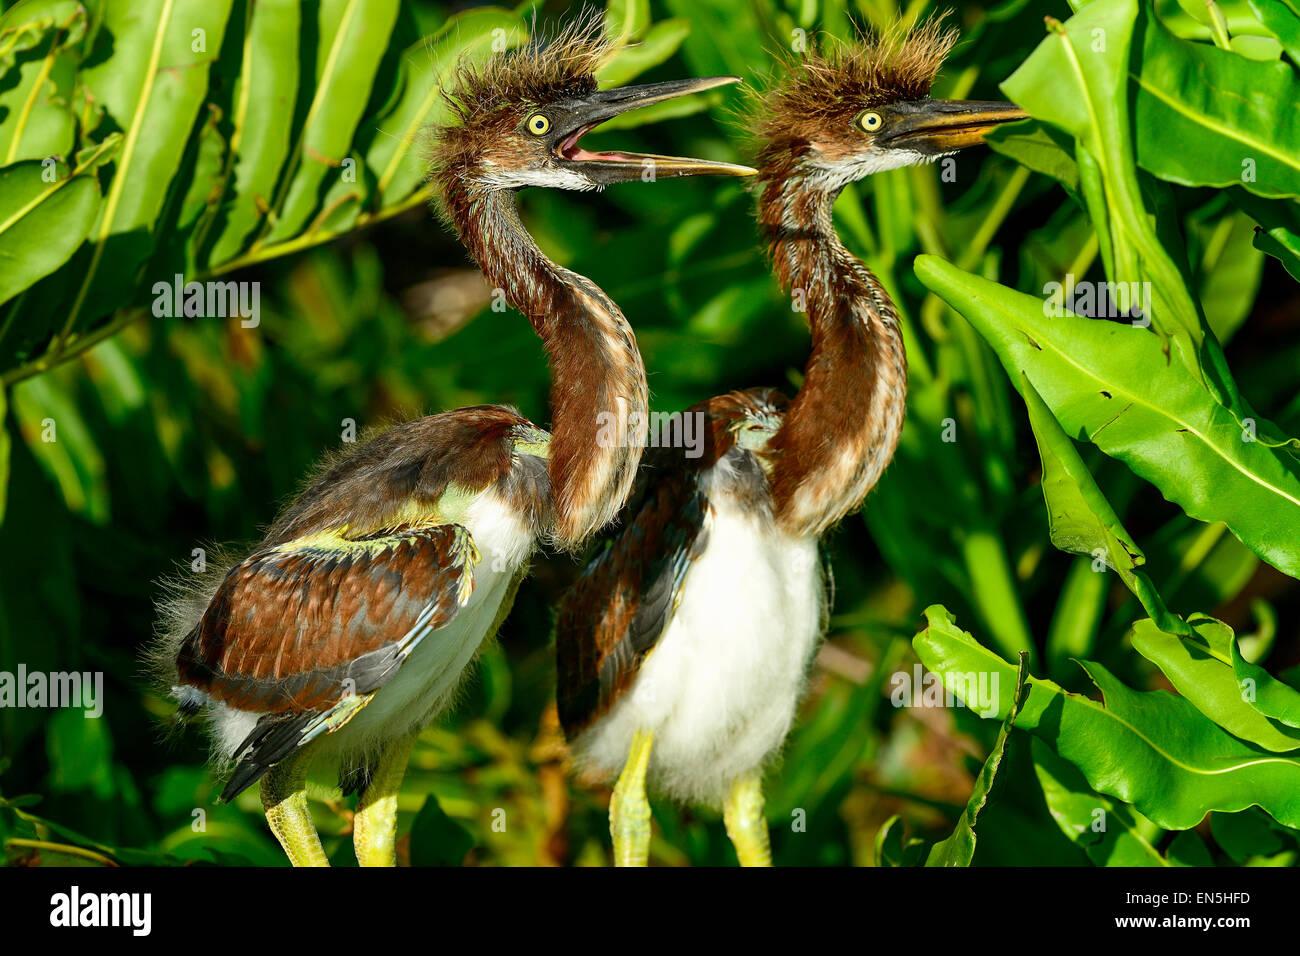 tricolored heron, wacodahatchee wetlands - Stock Image